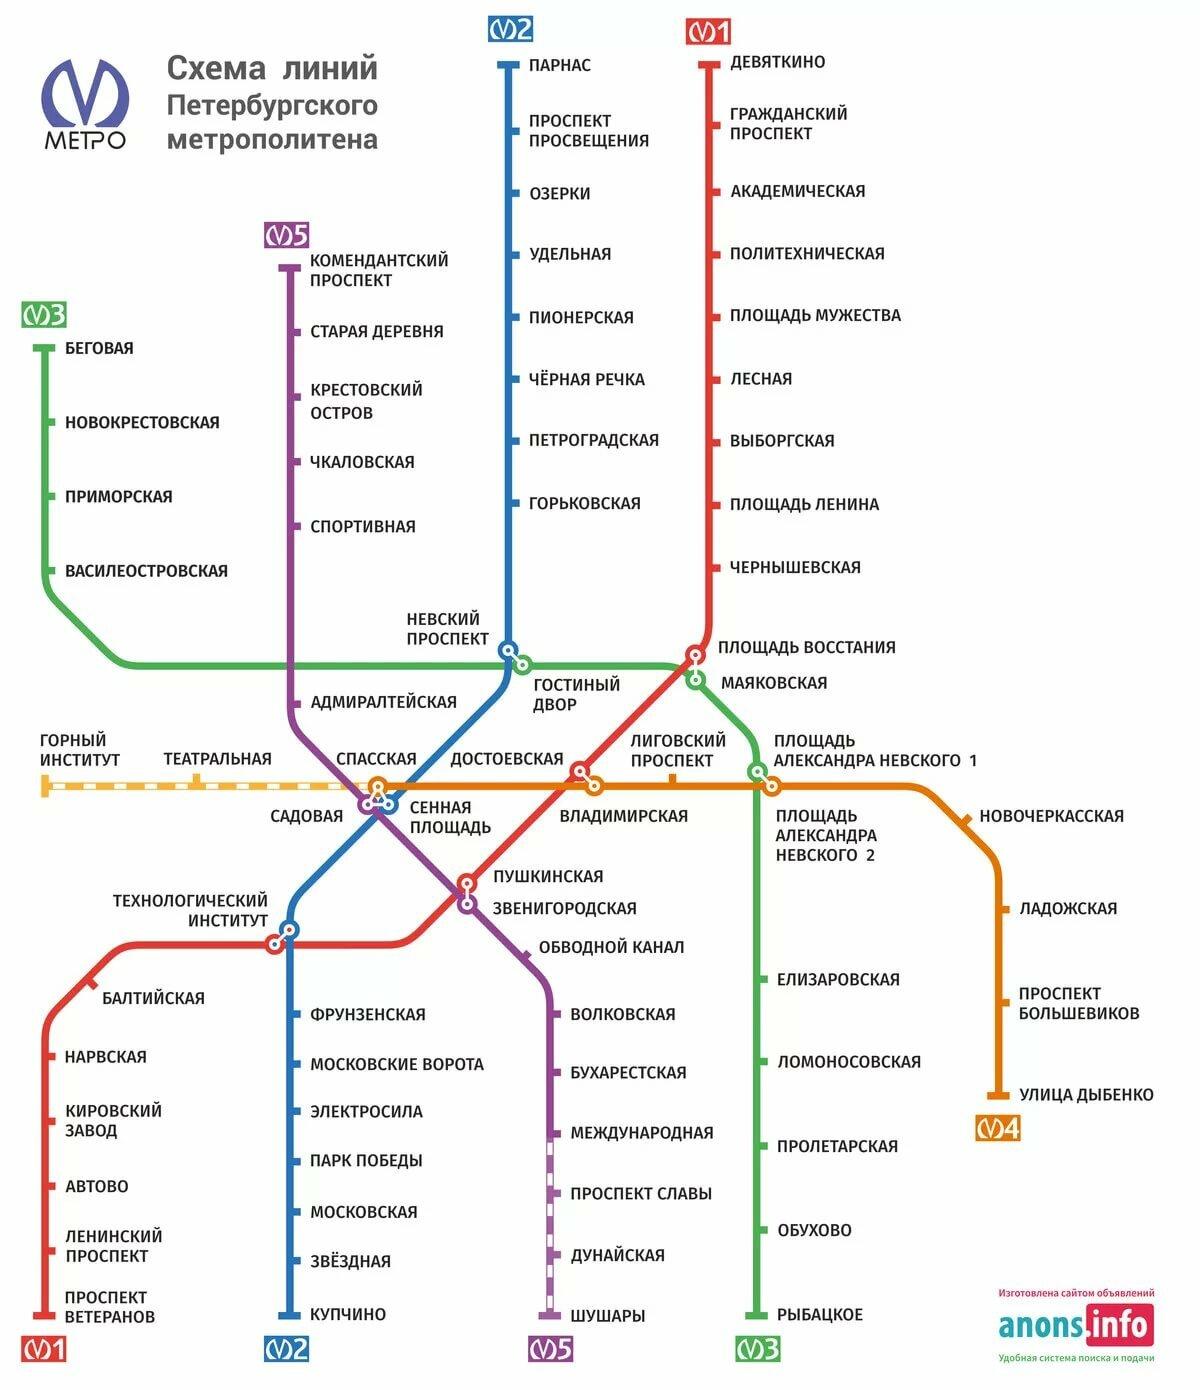 метро спб картинка схема